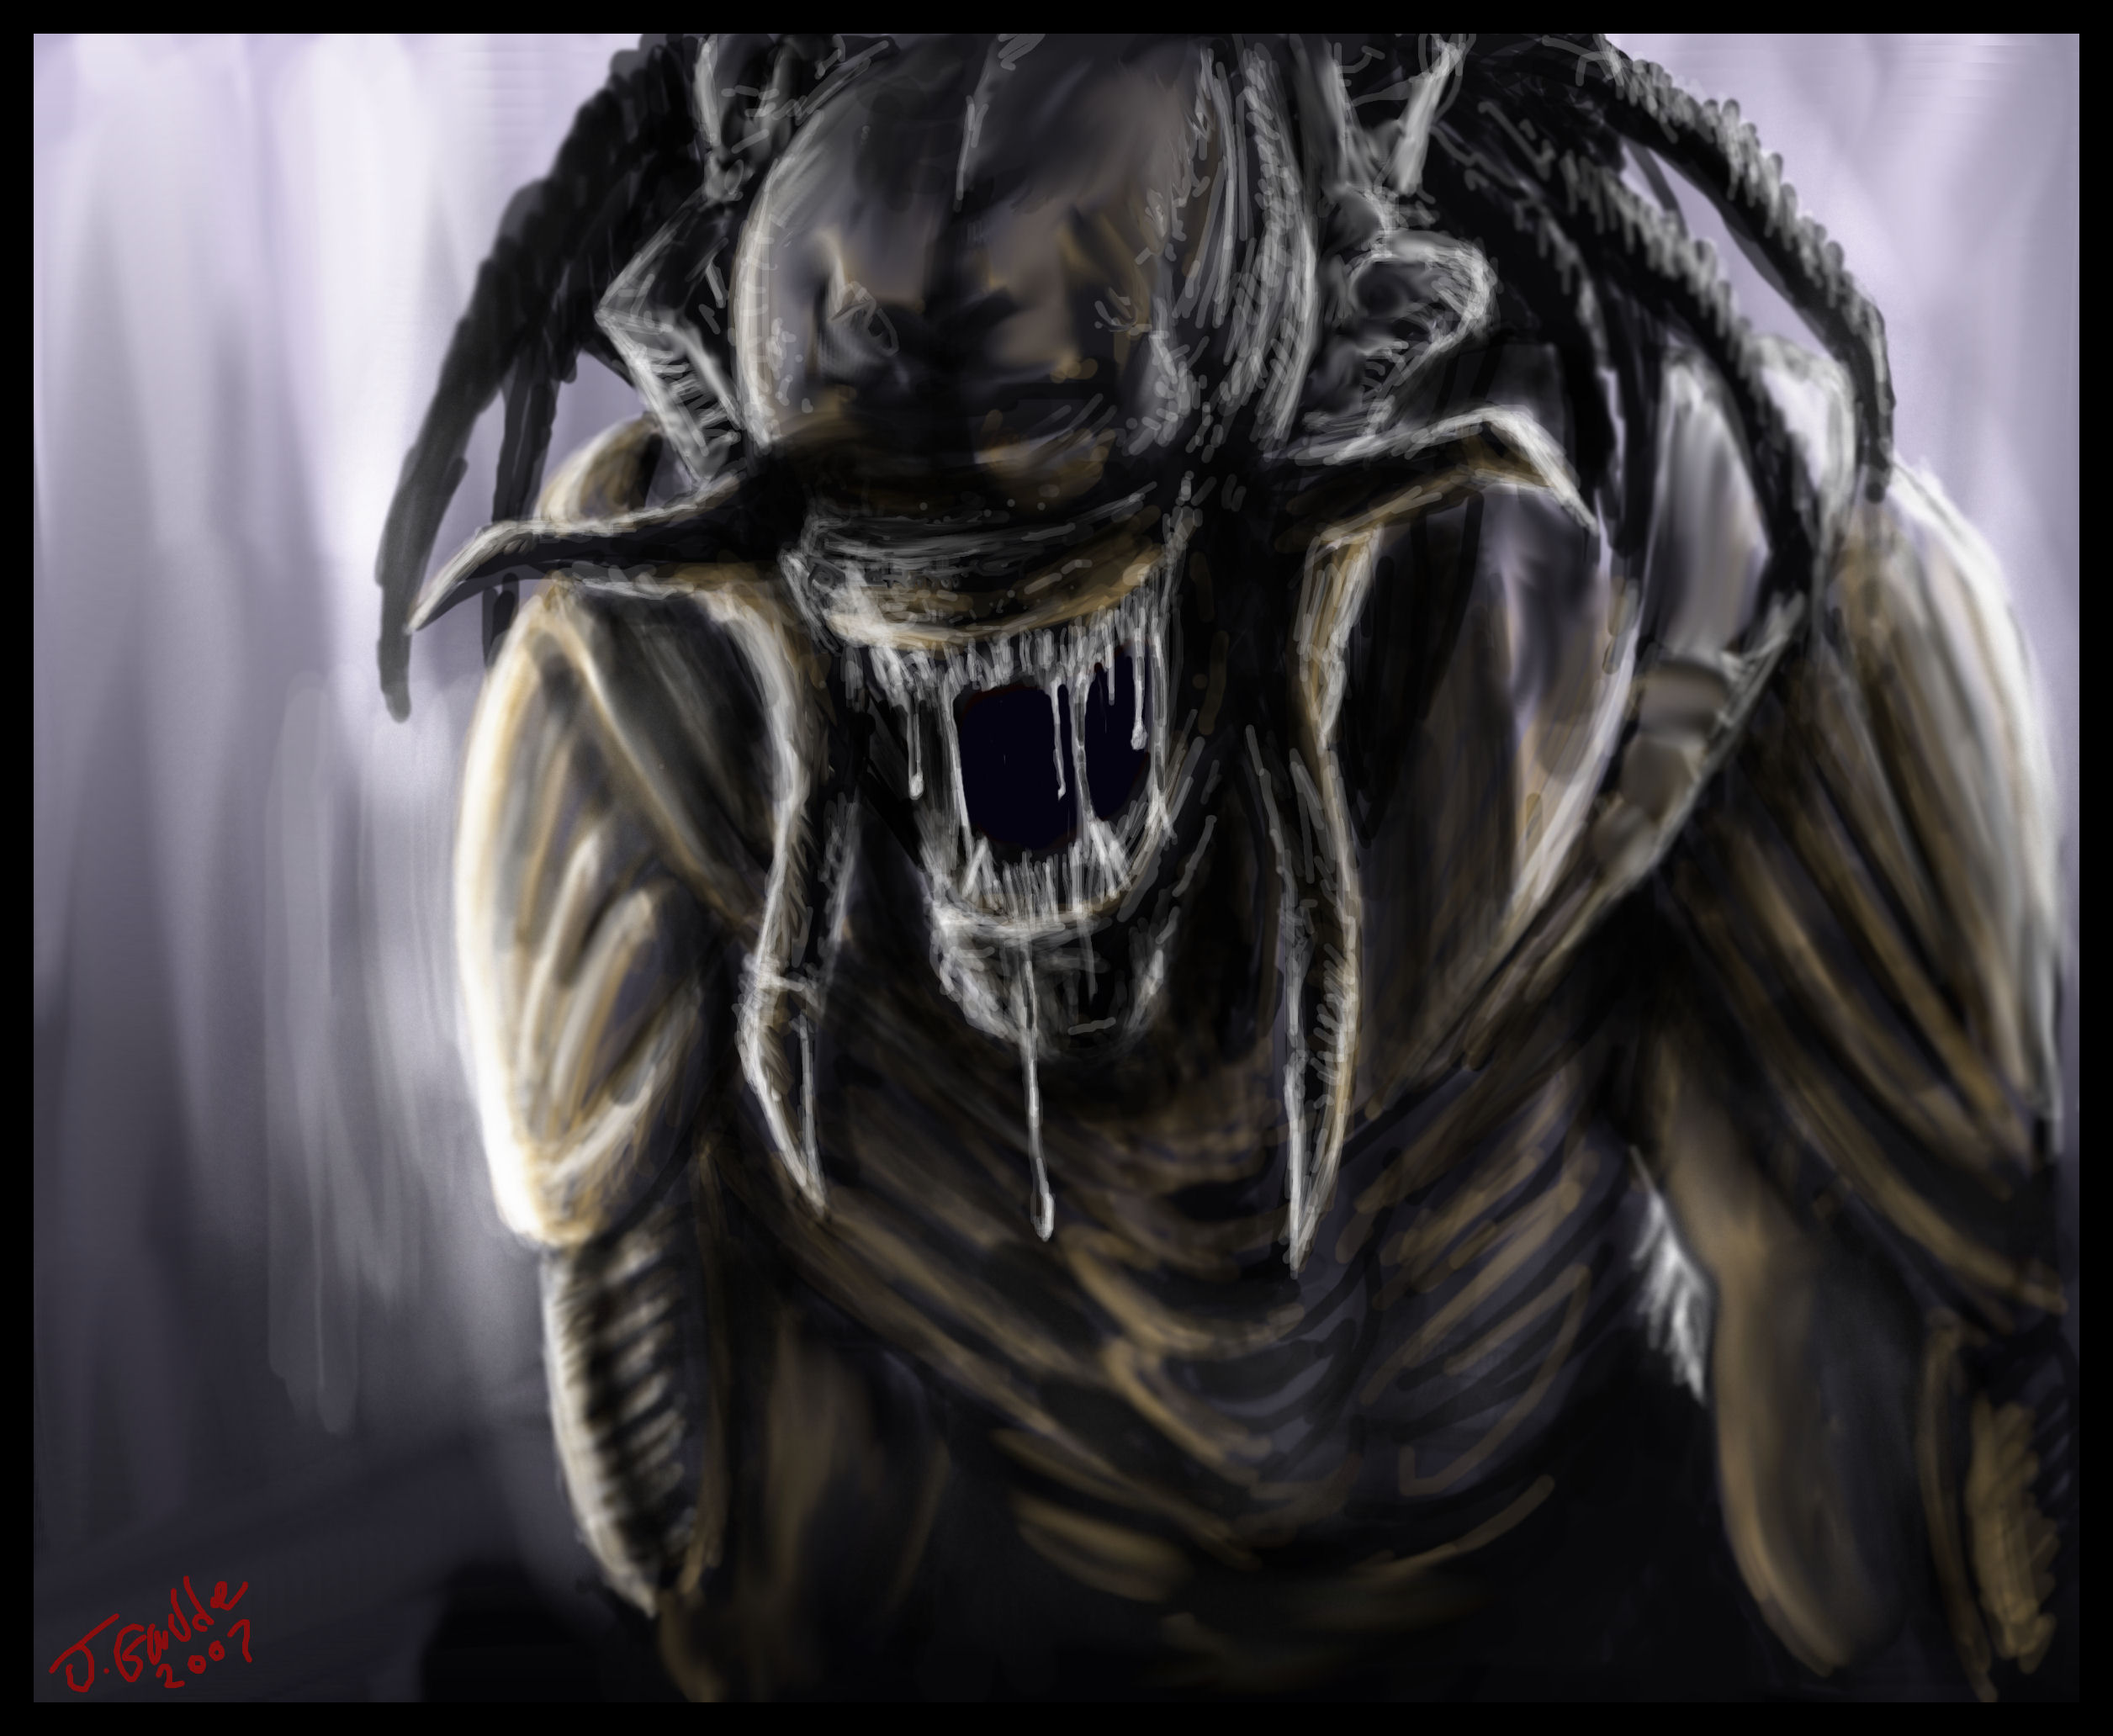 Symbiote Predator vs Predalien | FantasyFaceOff Forum